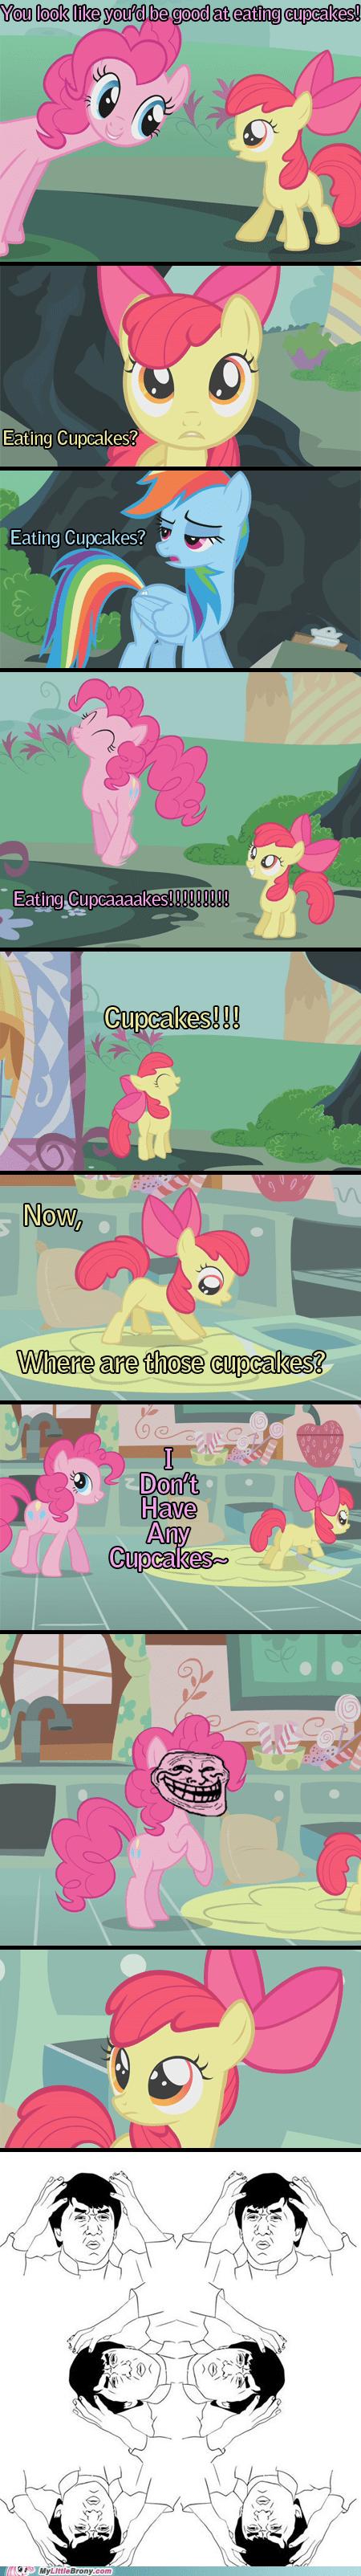 celestia cupcakes like apple cupcakes? yumm like-apple-cupcakes-yummmmmmmmmmmmmmmm thats-a-nice-cutie-mark - 6548288768